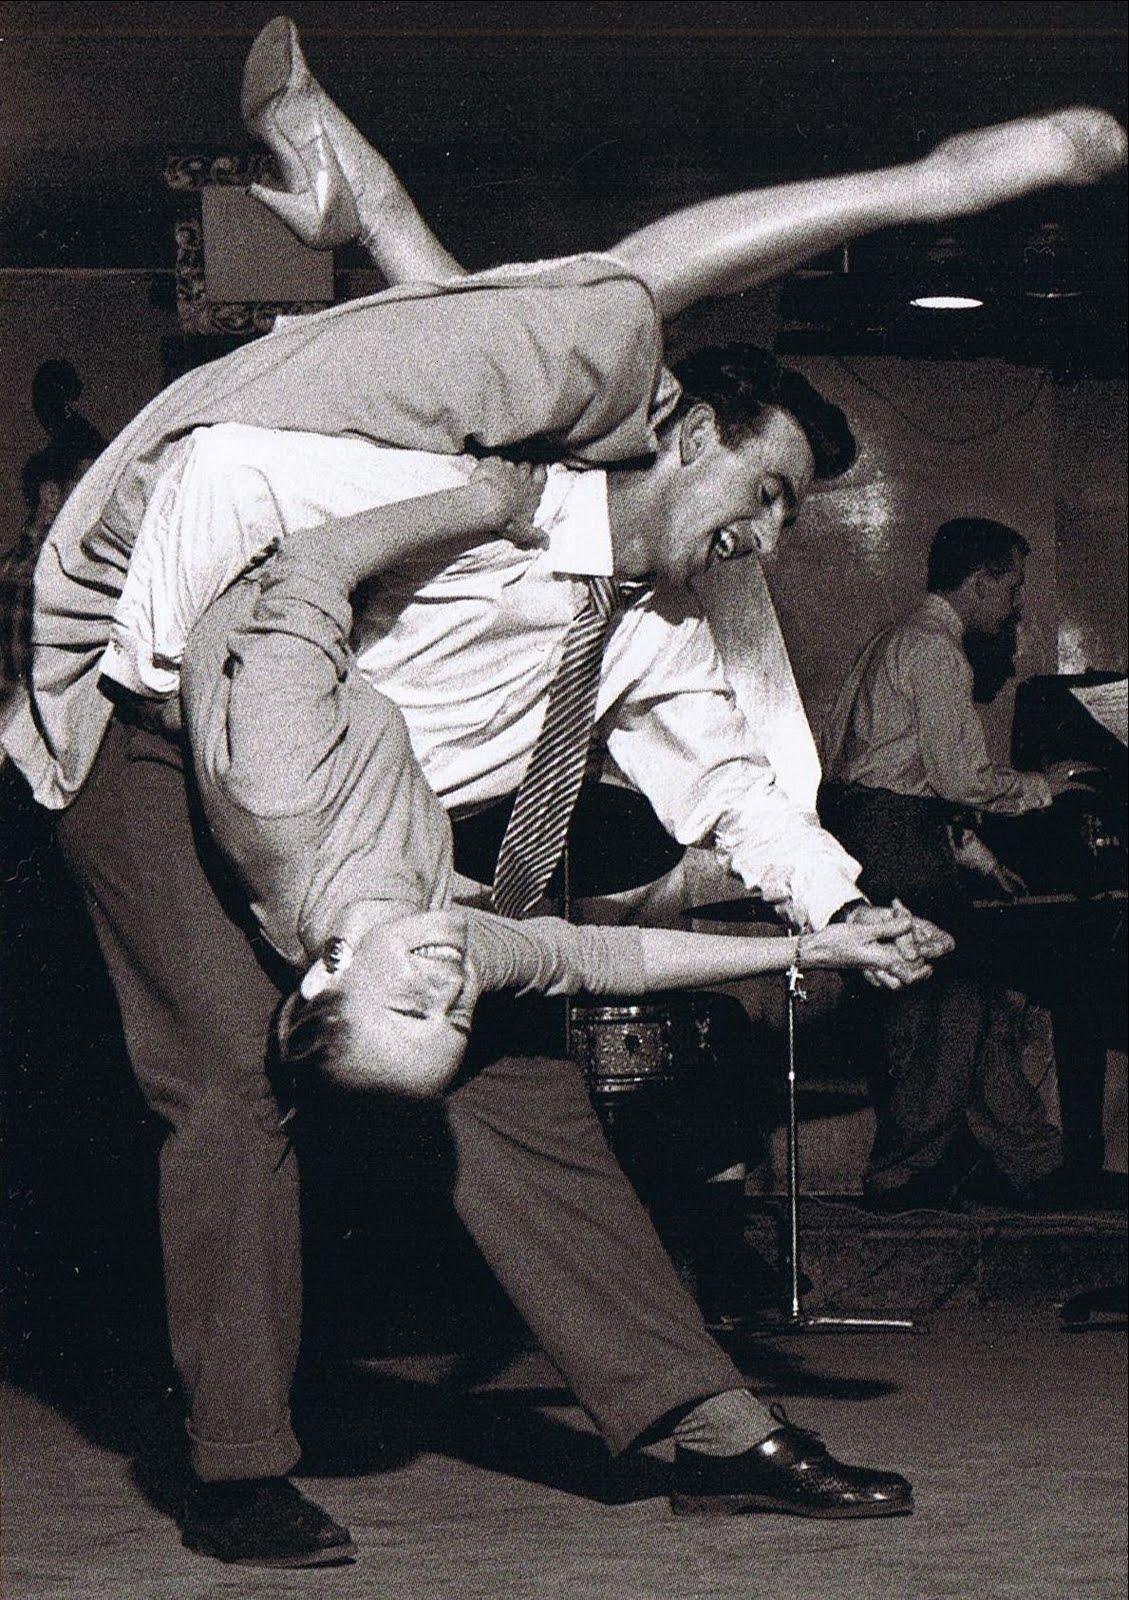 Dancing Branflakes: Bad Dancing